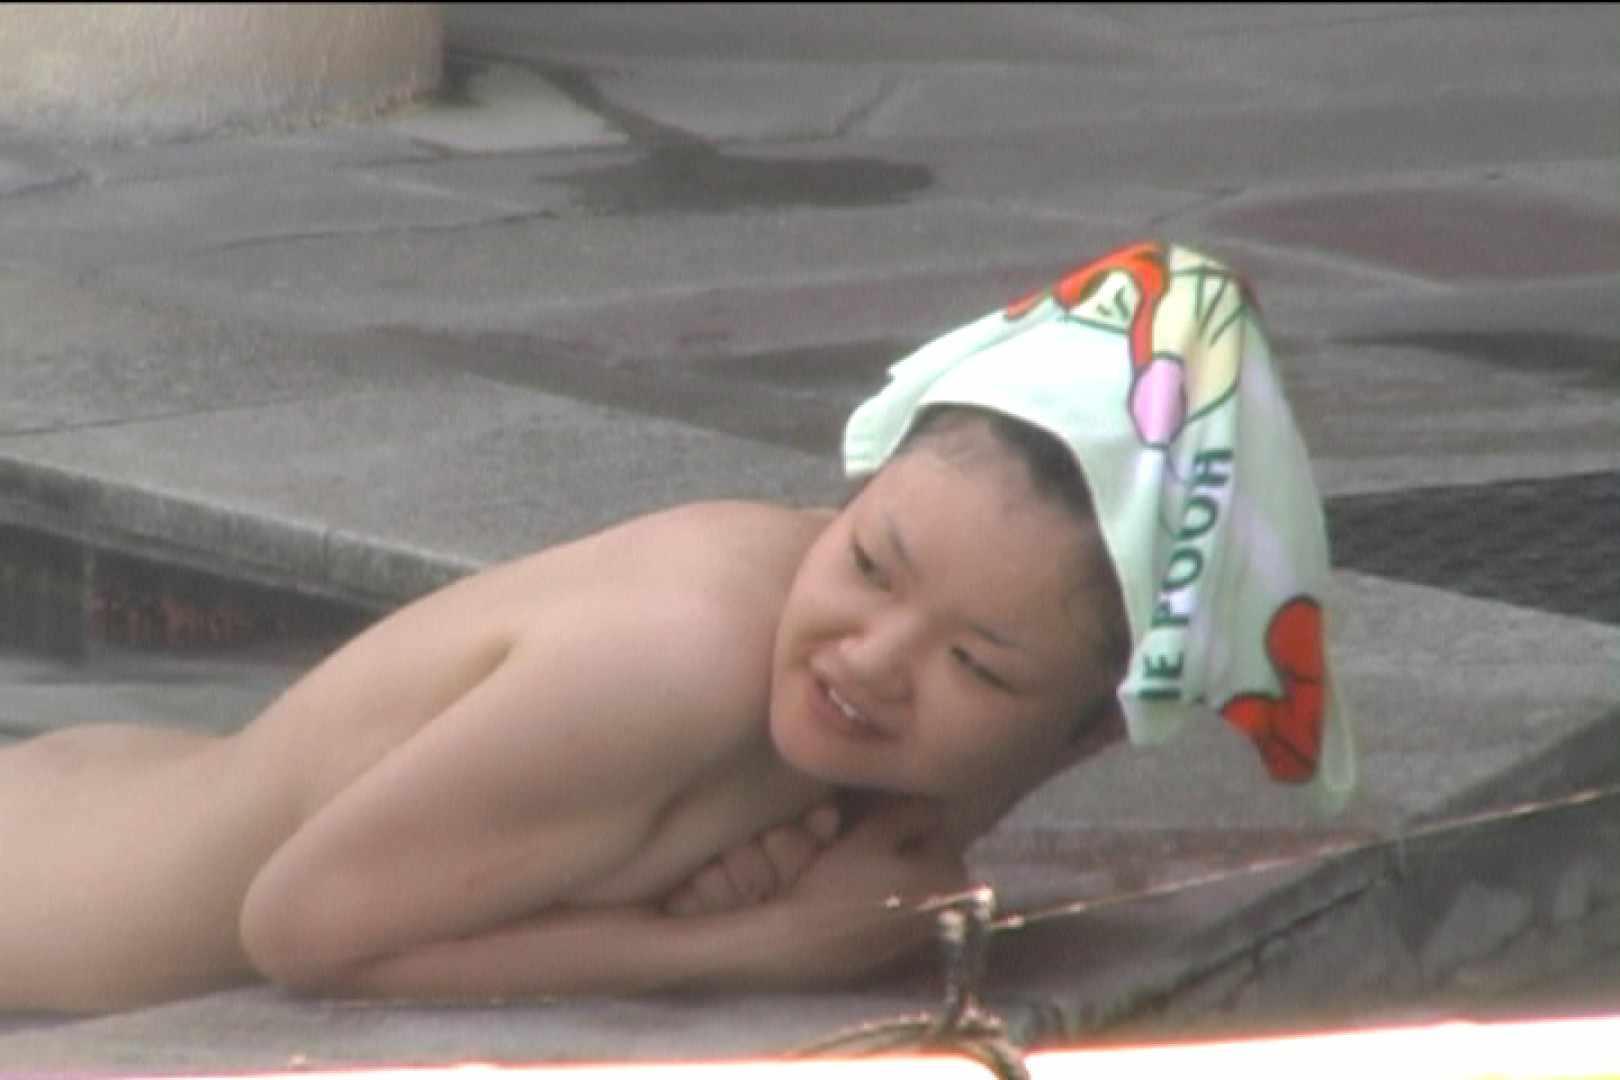 Aquaな露天風呂Vol.536 露天風呂 | OLのエロ生活  94連発 19